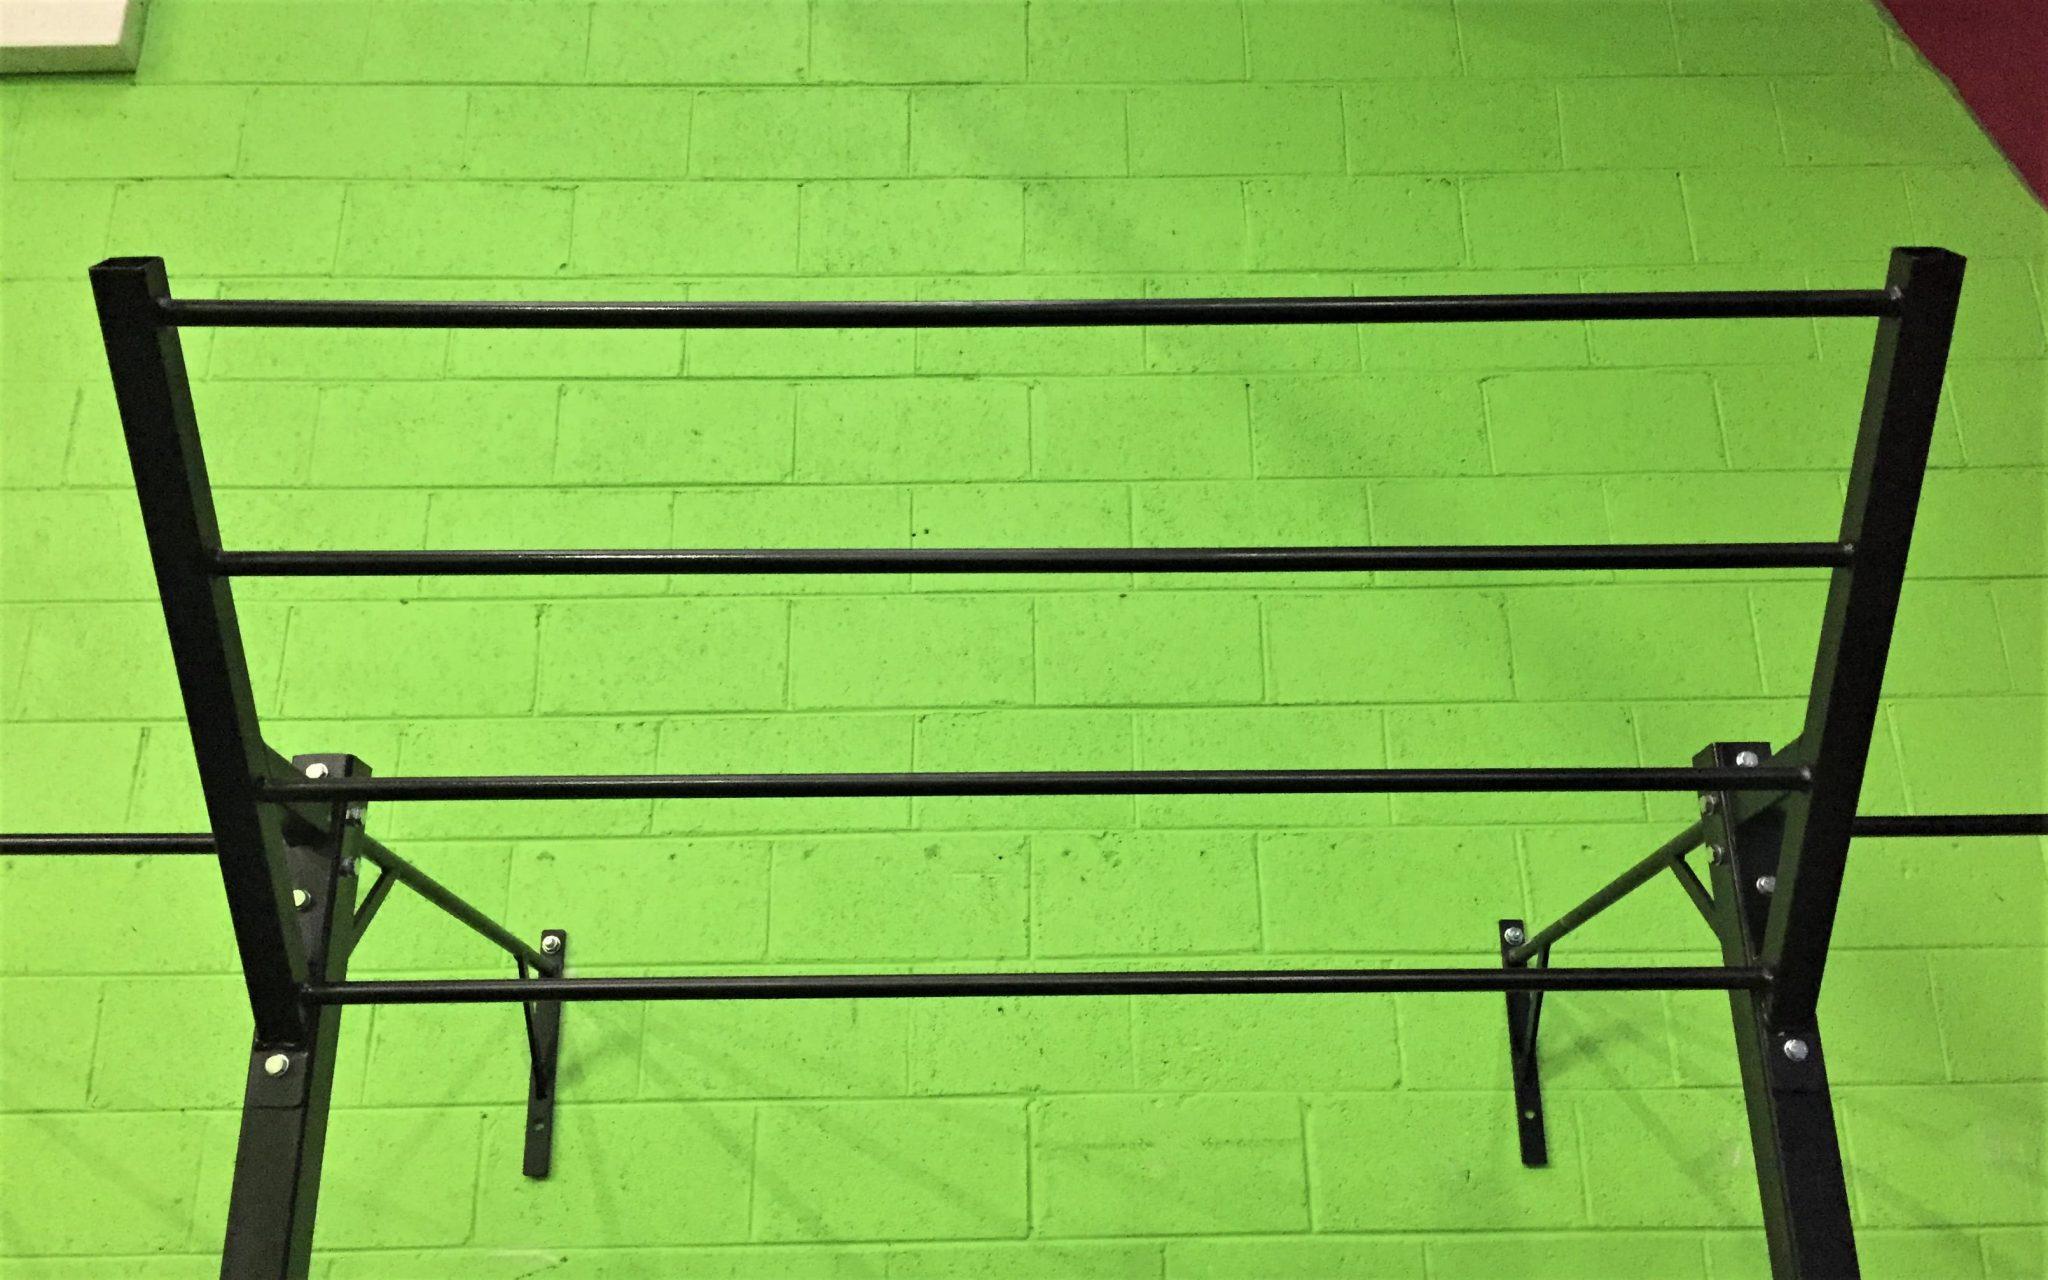 crossfit-flying-bars-min